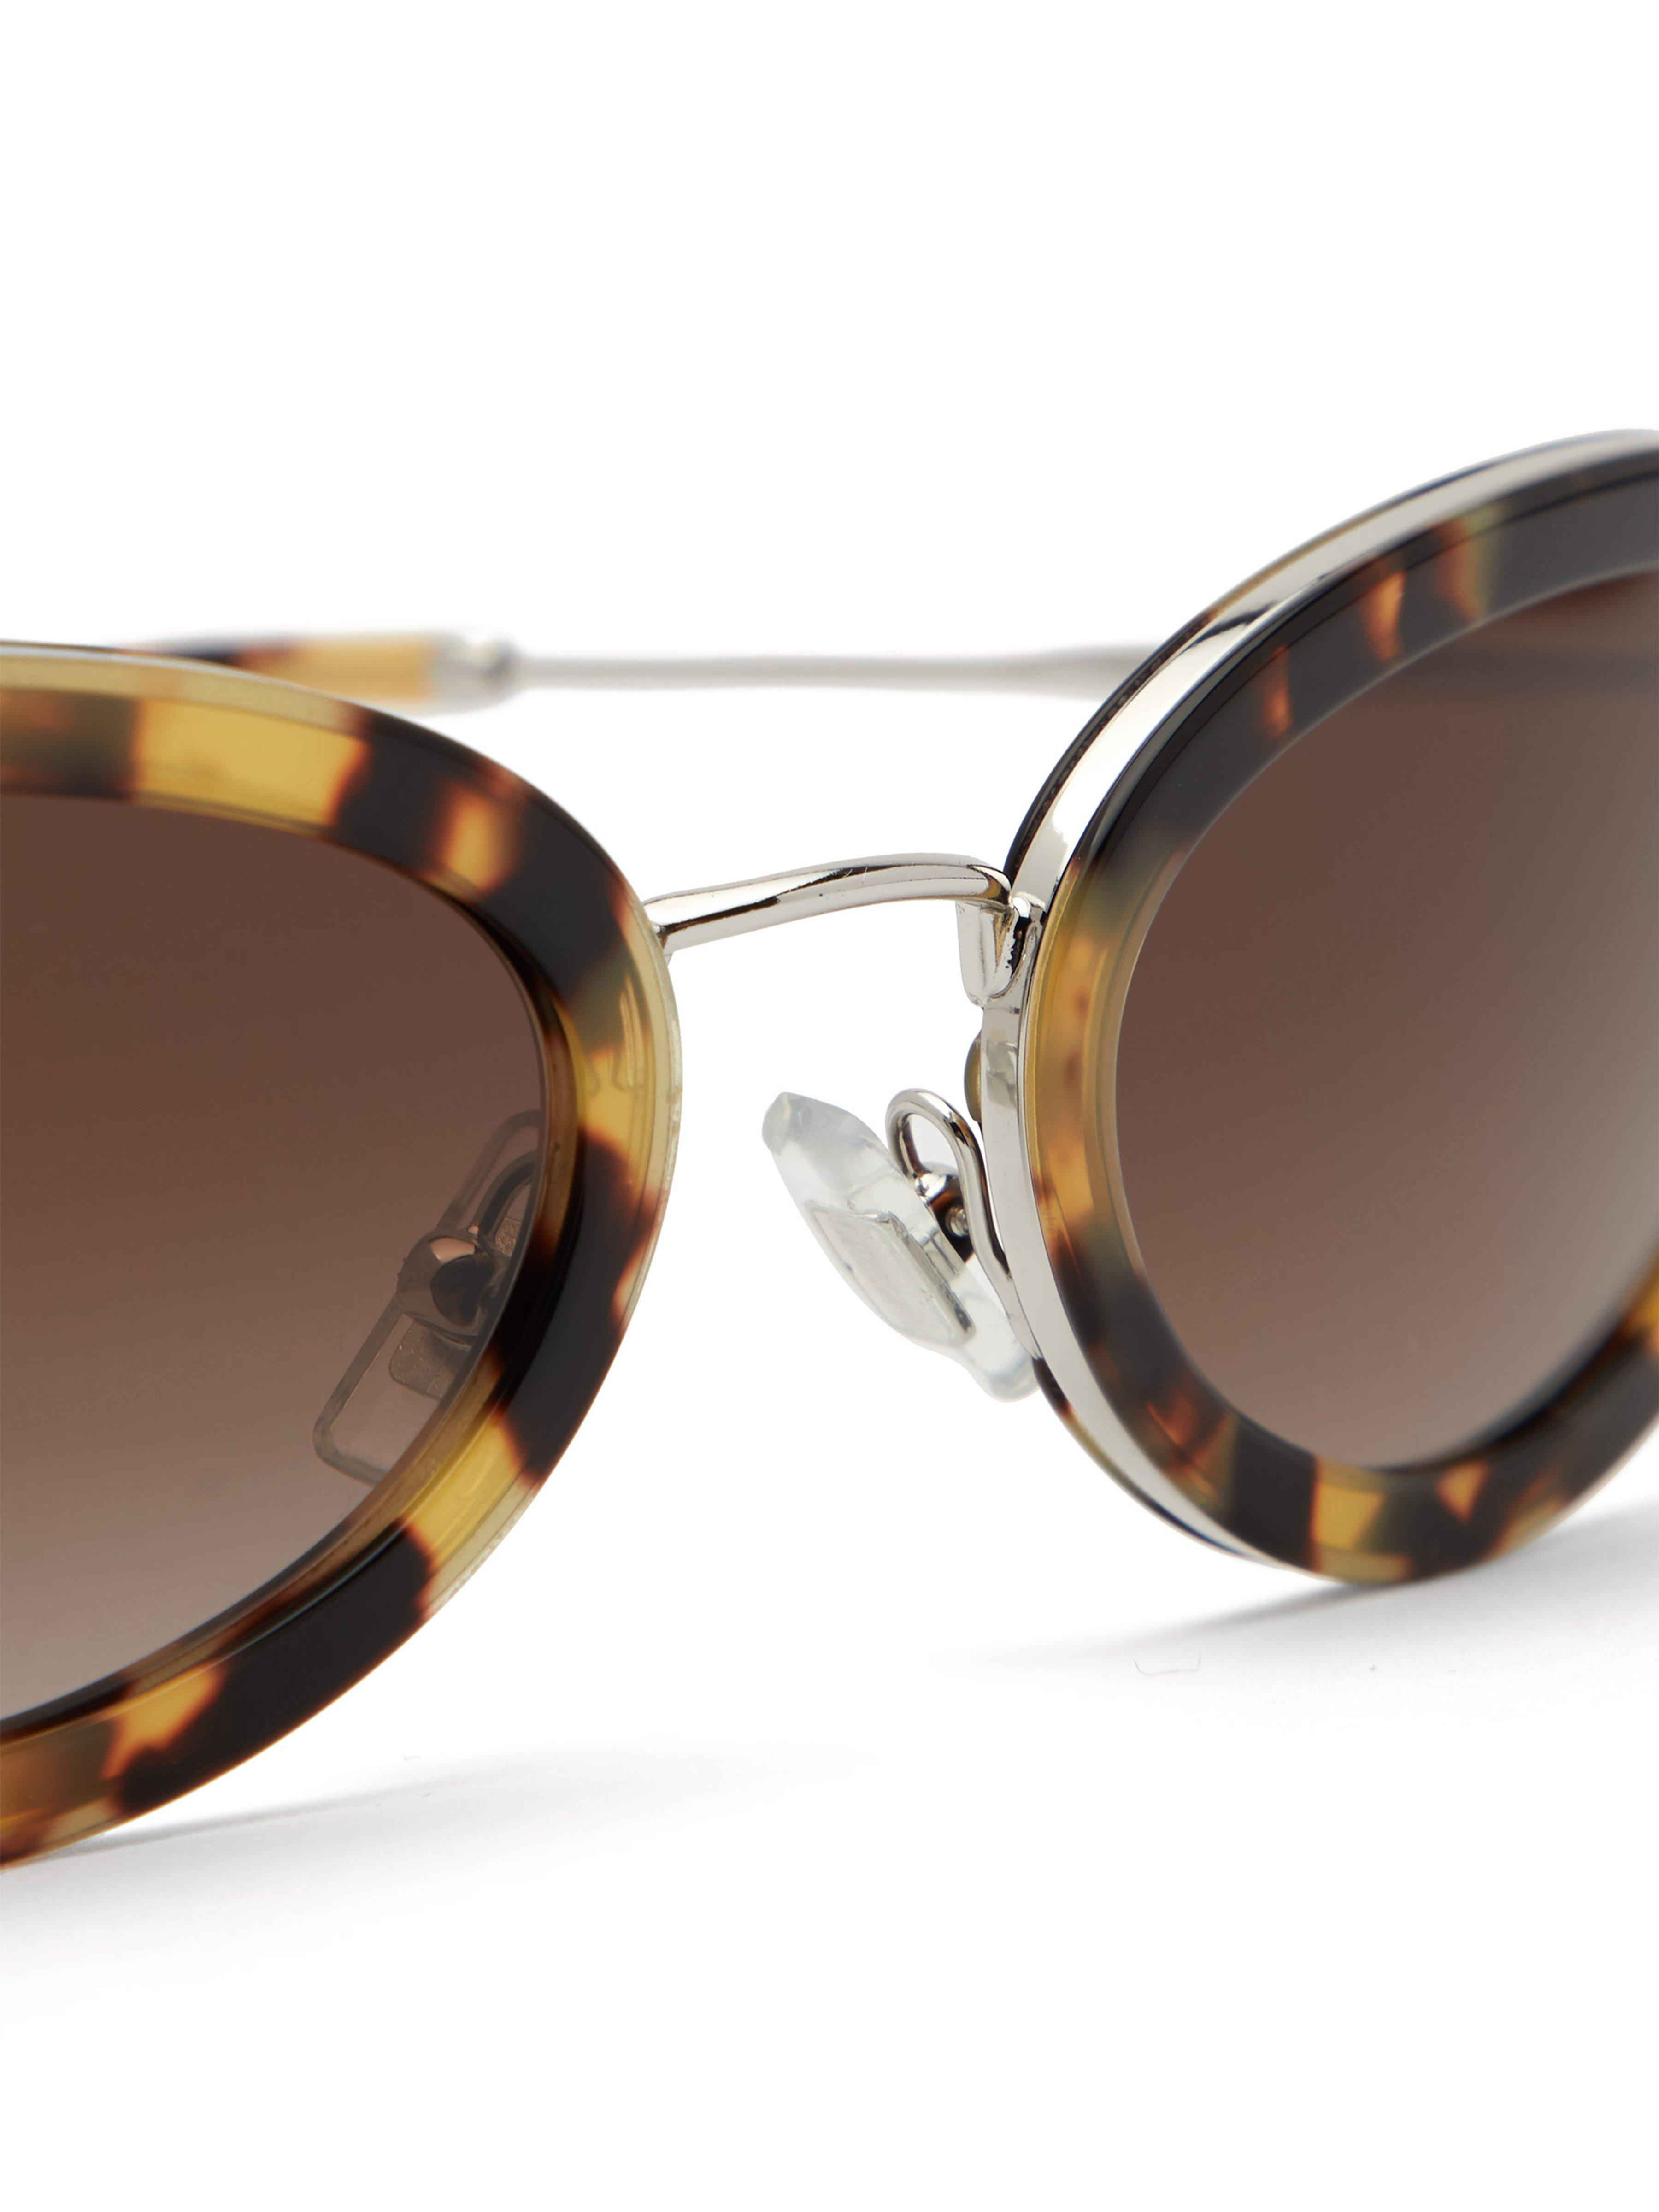 7a2754b92ec30 Miu Miu - Brown Délice Tortoiseshell Acetate Oval Sunglasses - Lyst. View  fullscreen